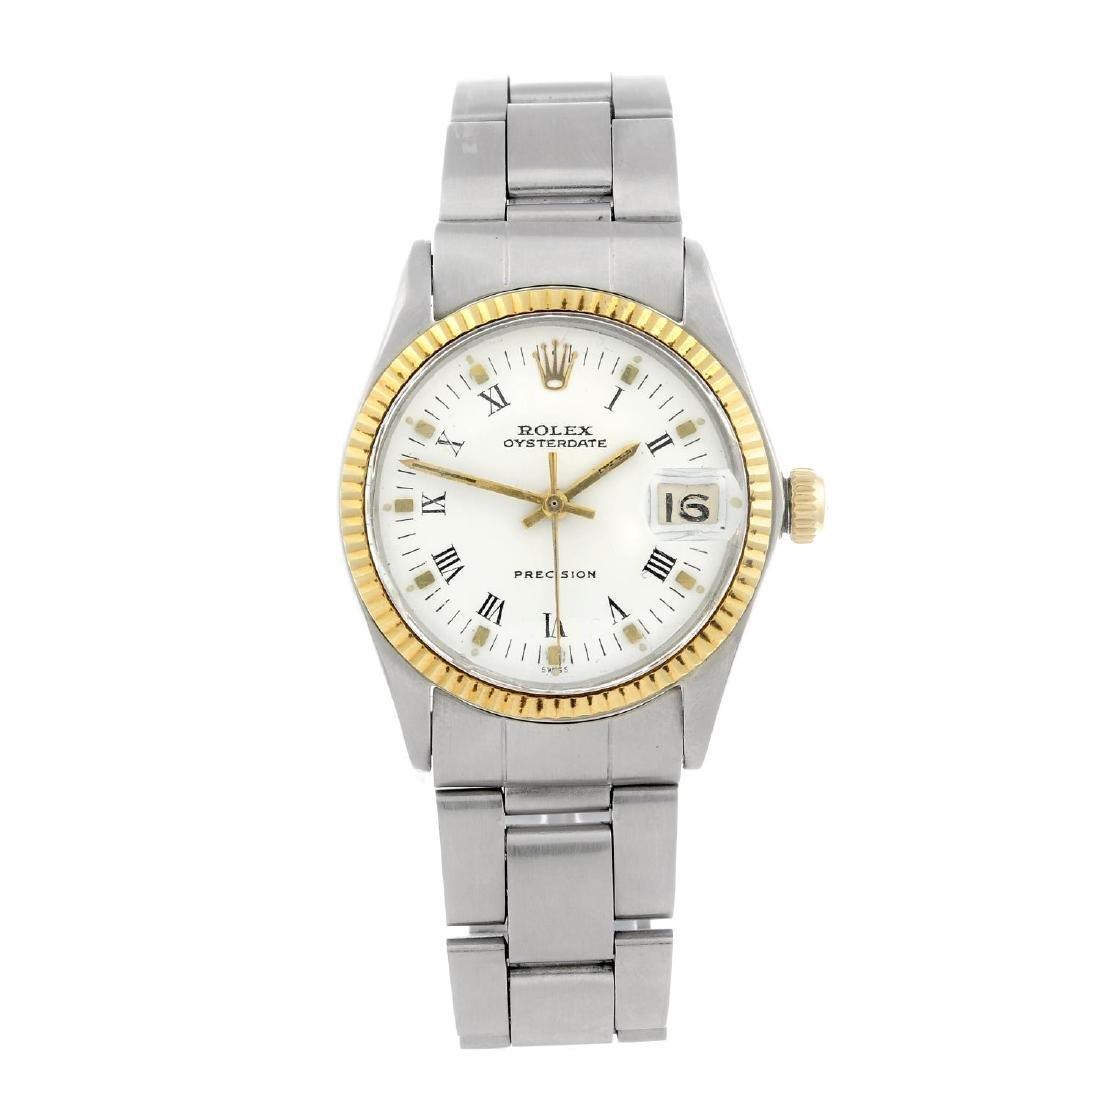 ROLEX - a mid-size Oysterdate Precision bracelet watch.